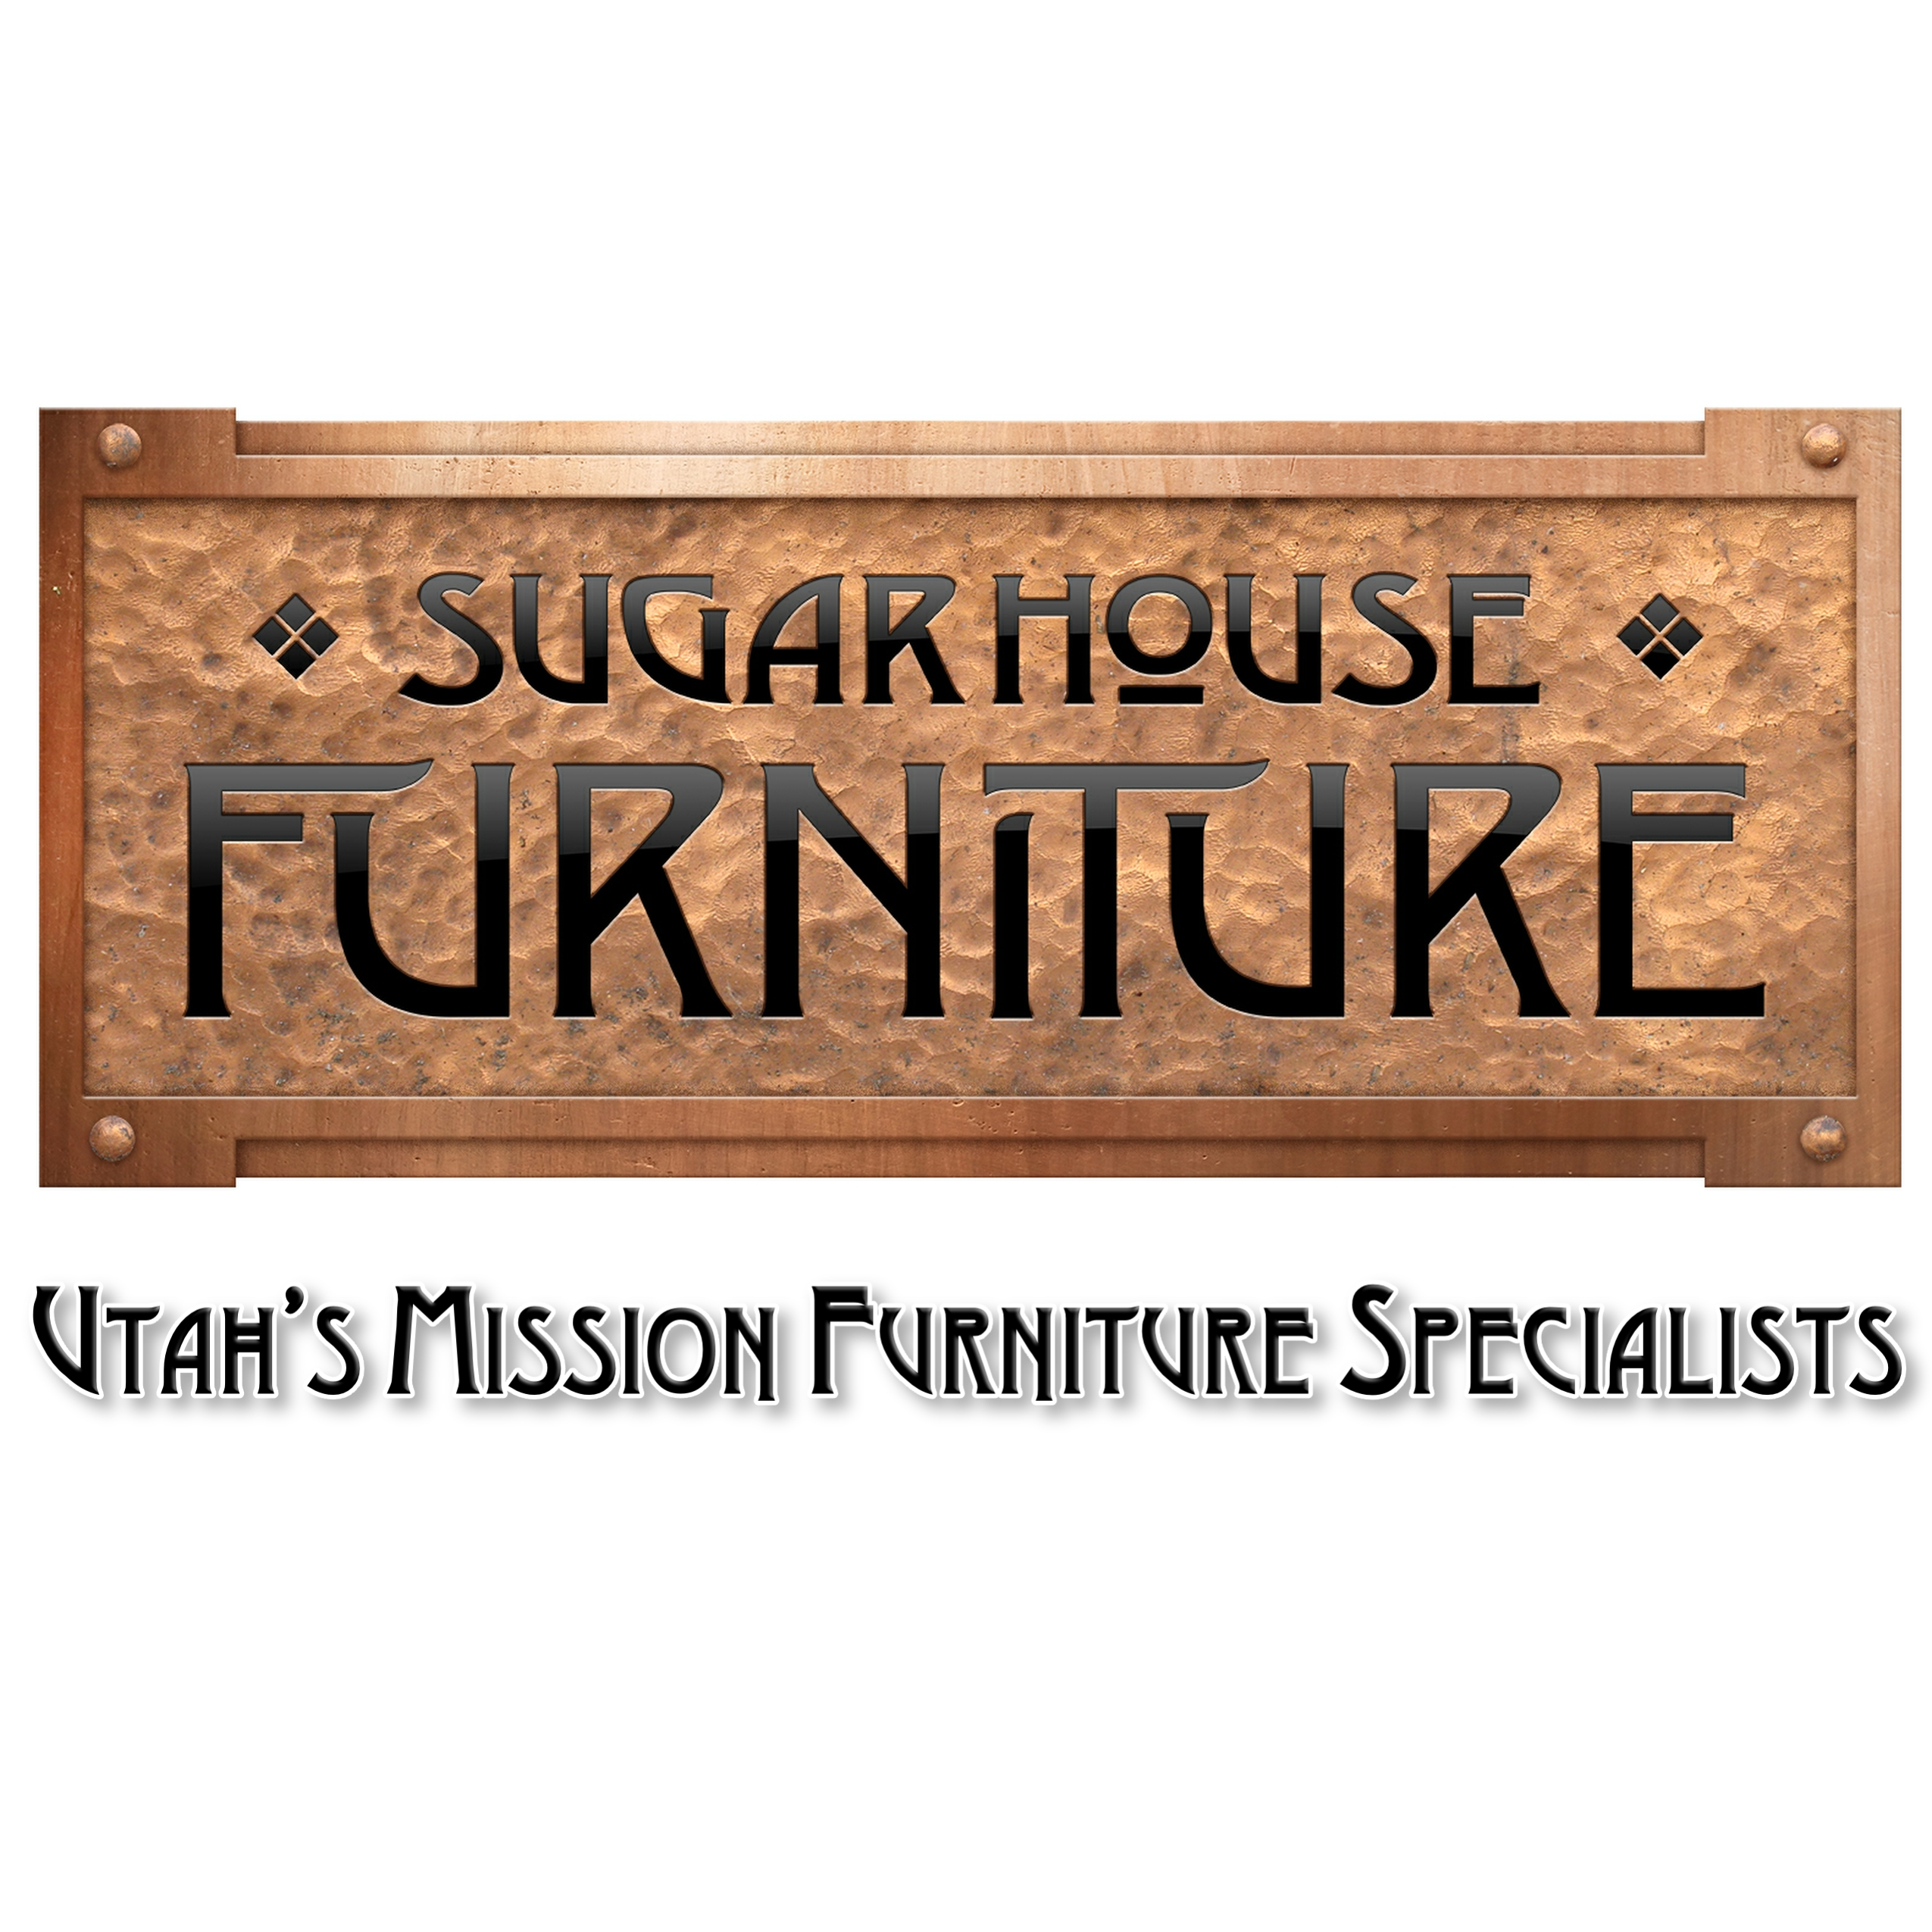 Beautiful Sugarhouse Furniture 2892 S Highland Dr, Salt Lake City, UT 84106   YP.com